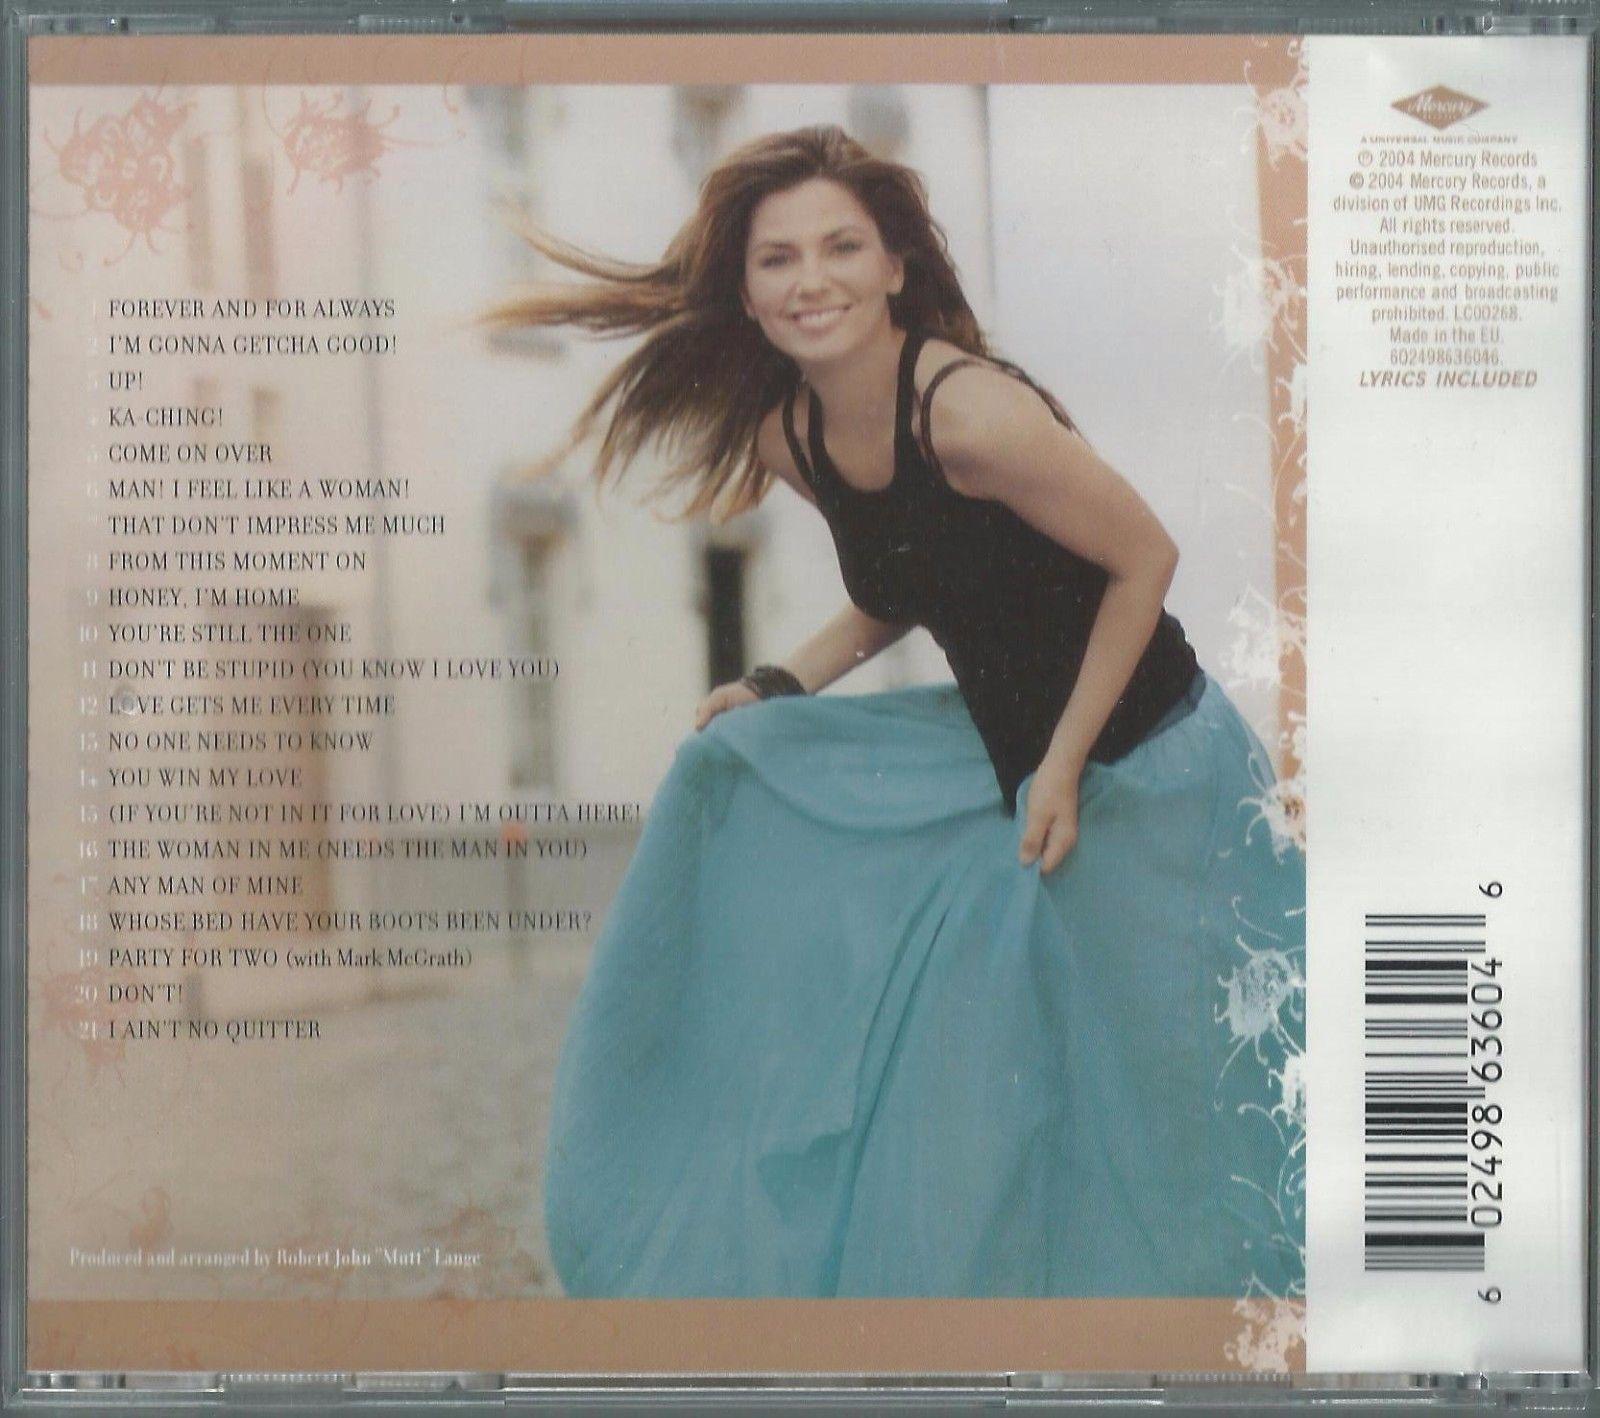 SHANIA TWAIN - GREATEST HITS 2002 EU CD COMPILATION ALBUM